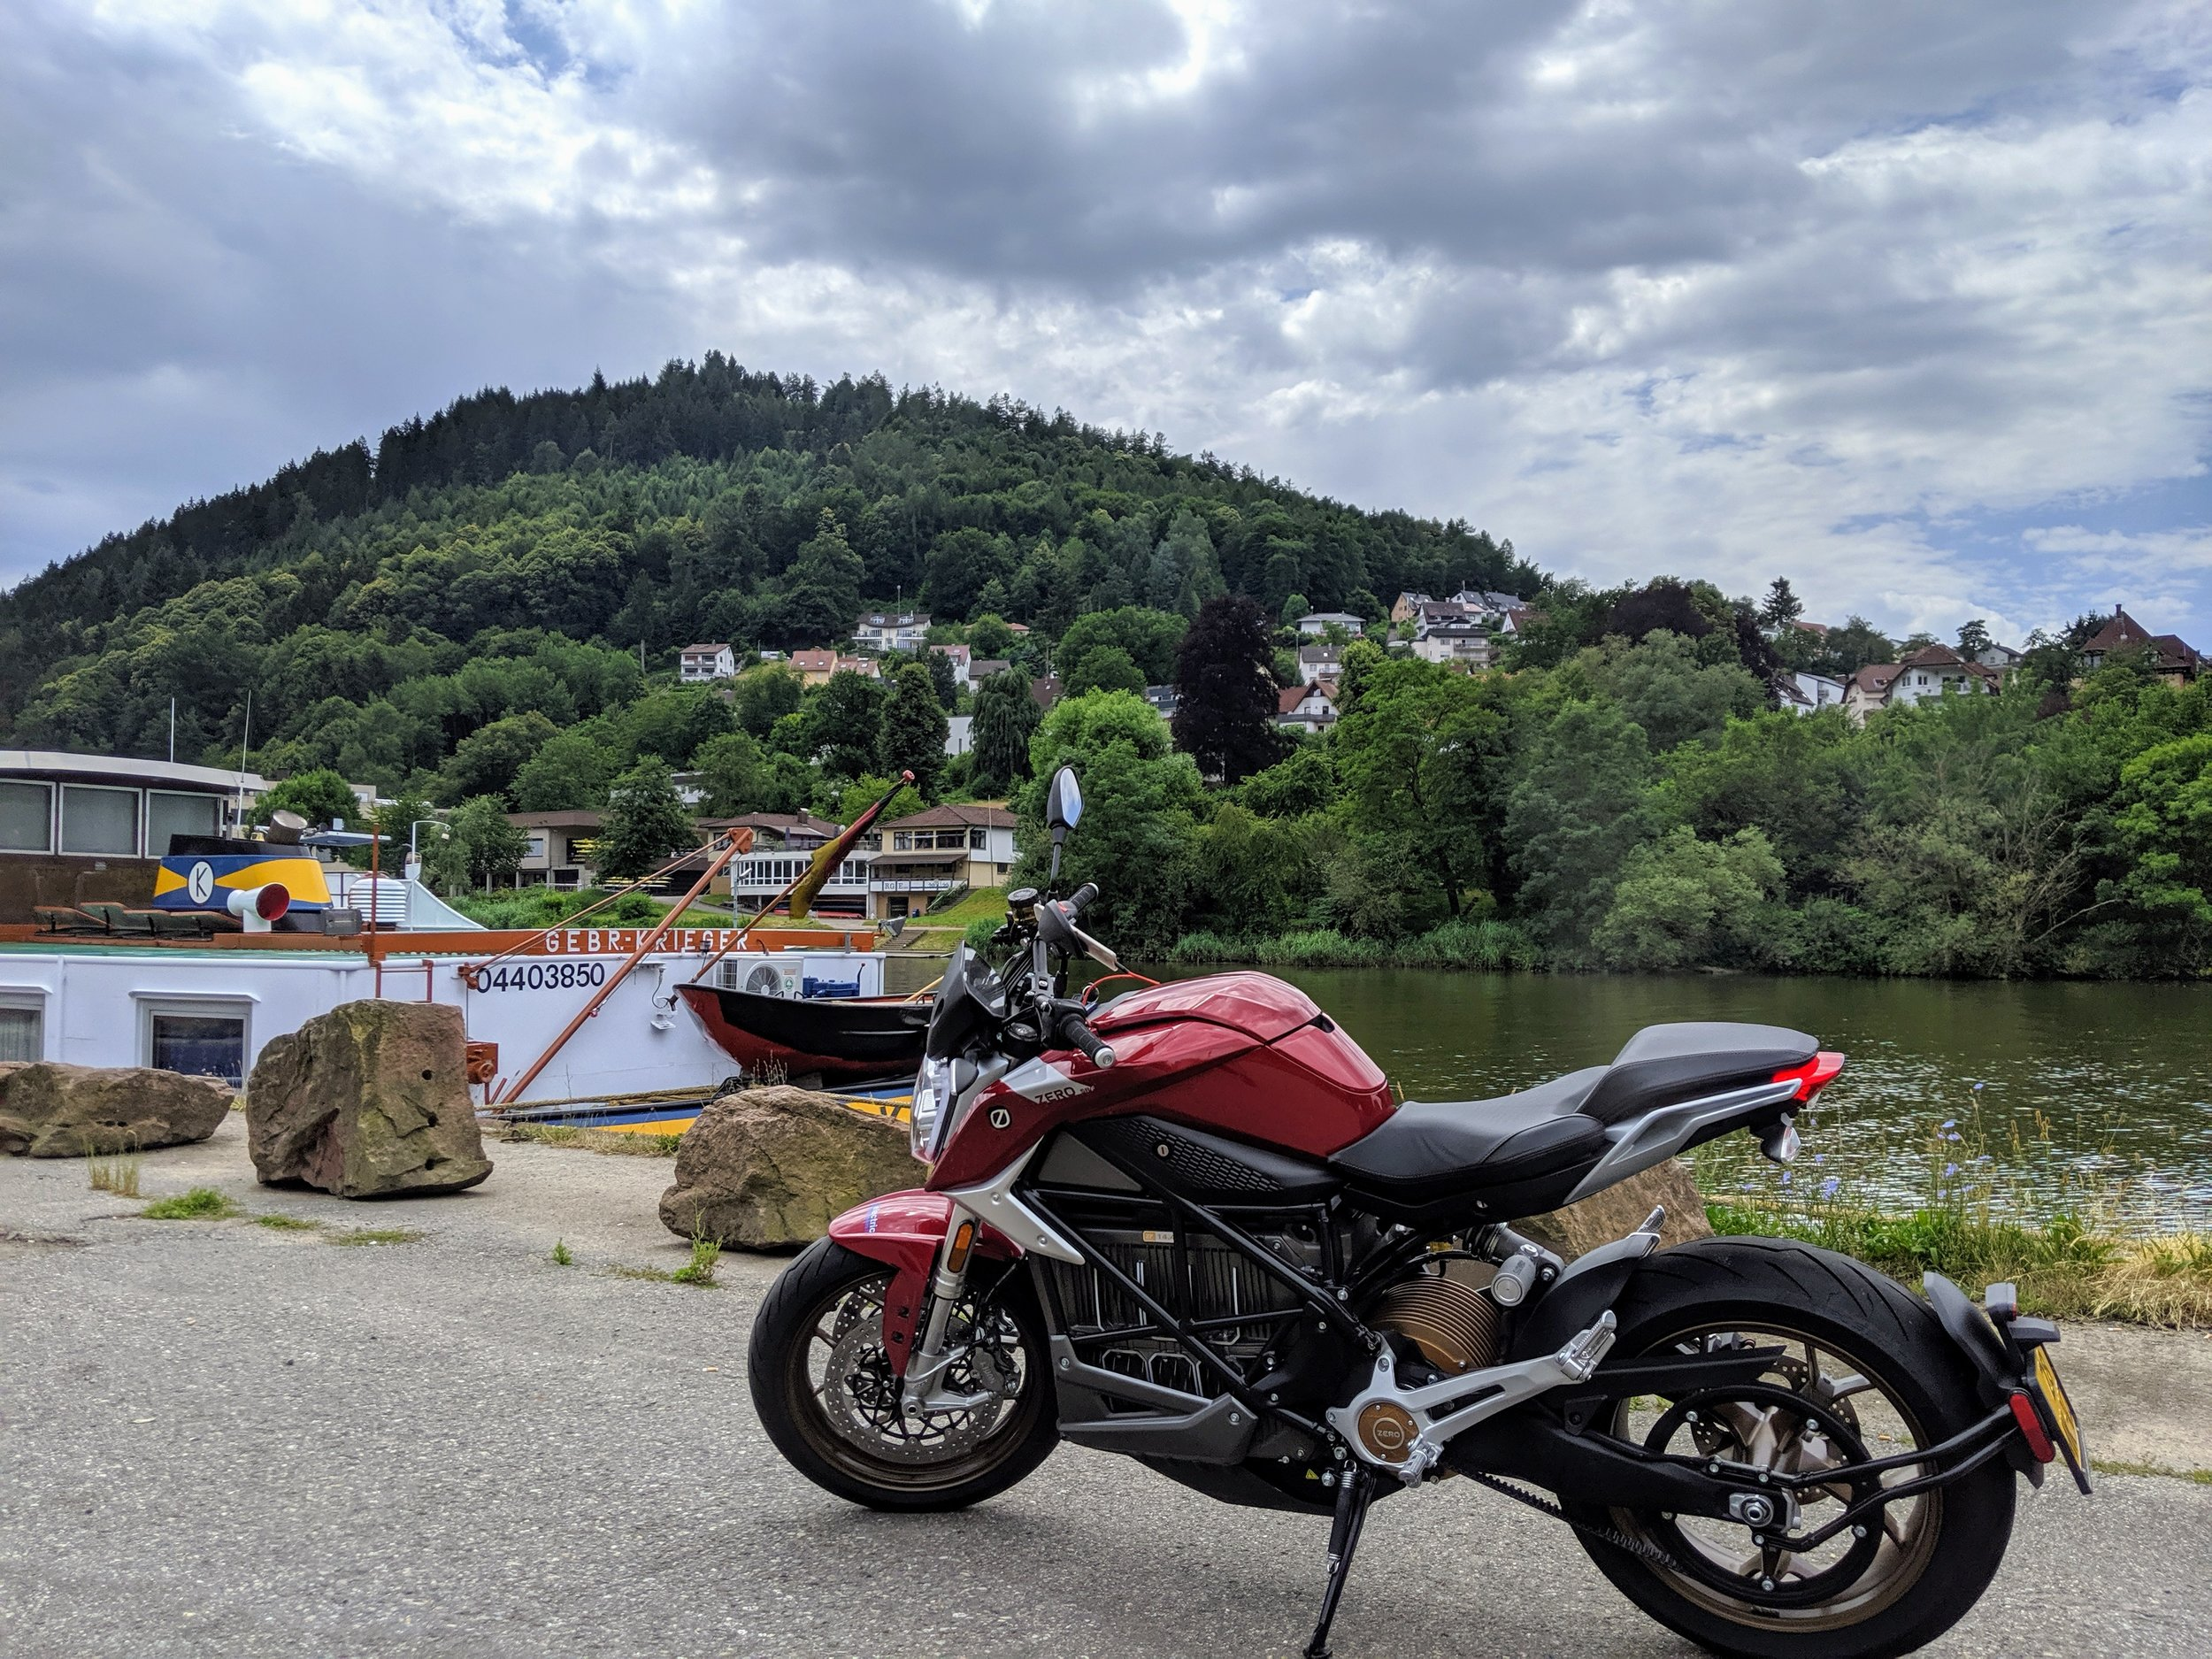 Photo break near Eberbach, Germany.